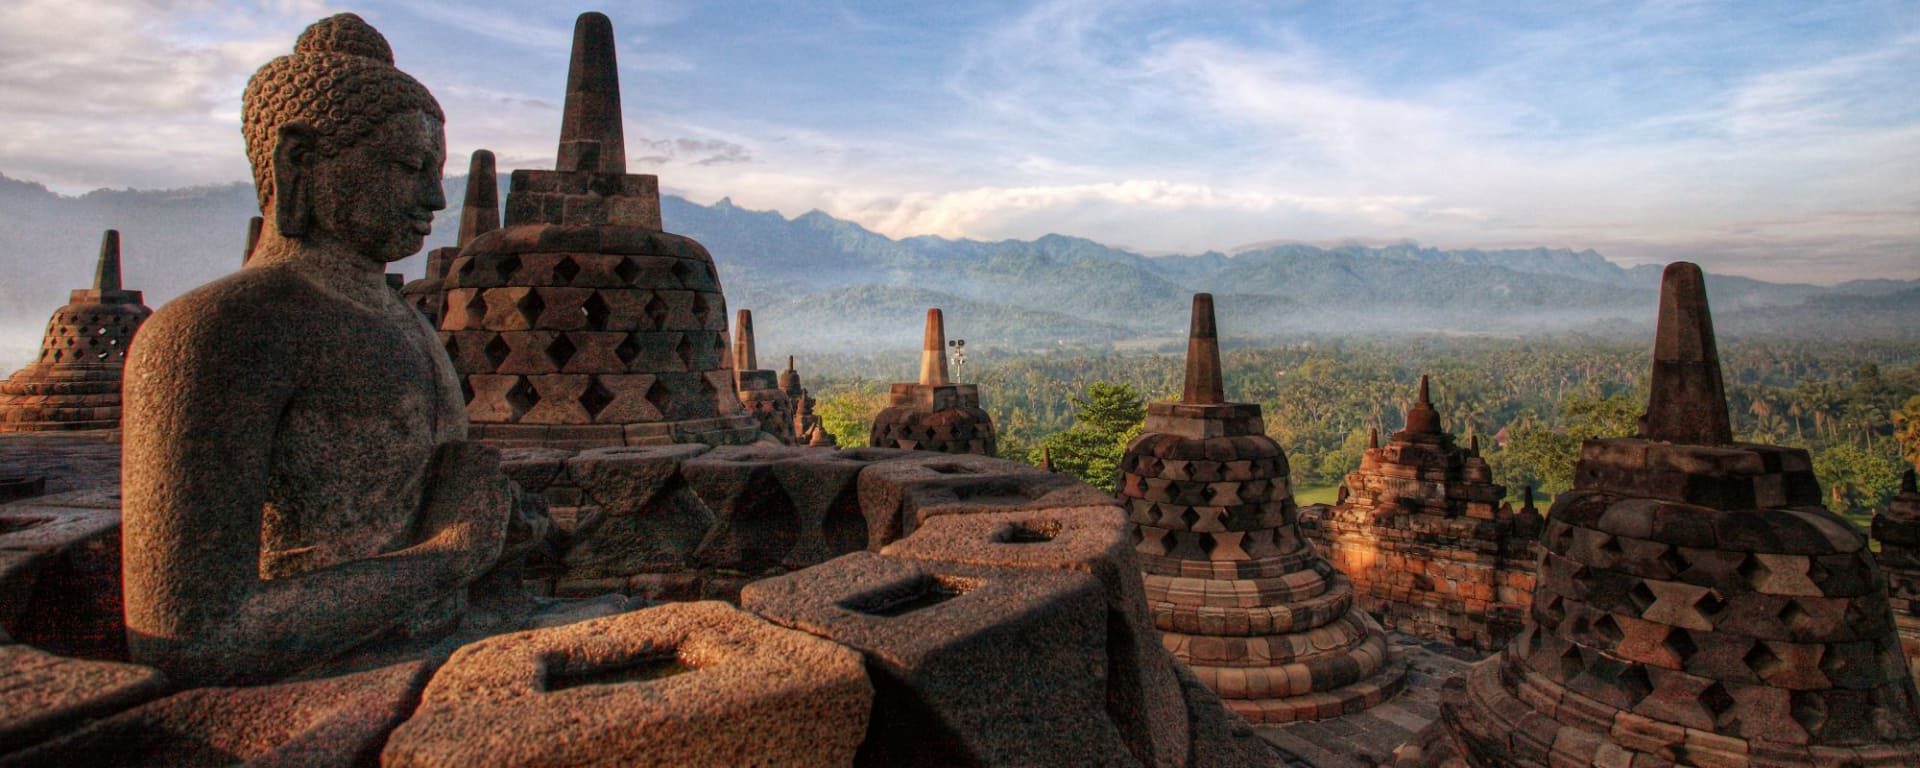 Lever du soleil au temple de Borobudur à Yogyakarta: Yogyakarta Borobudur